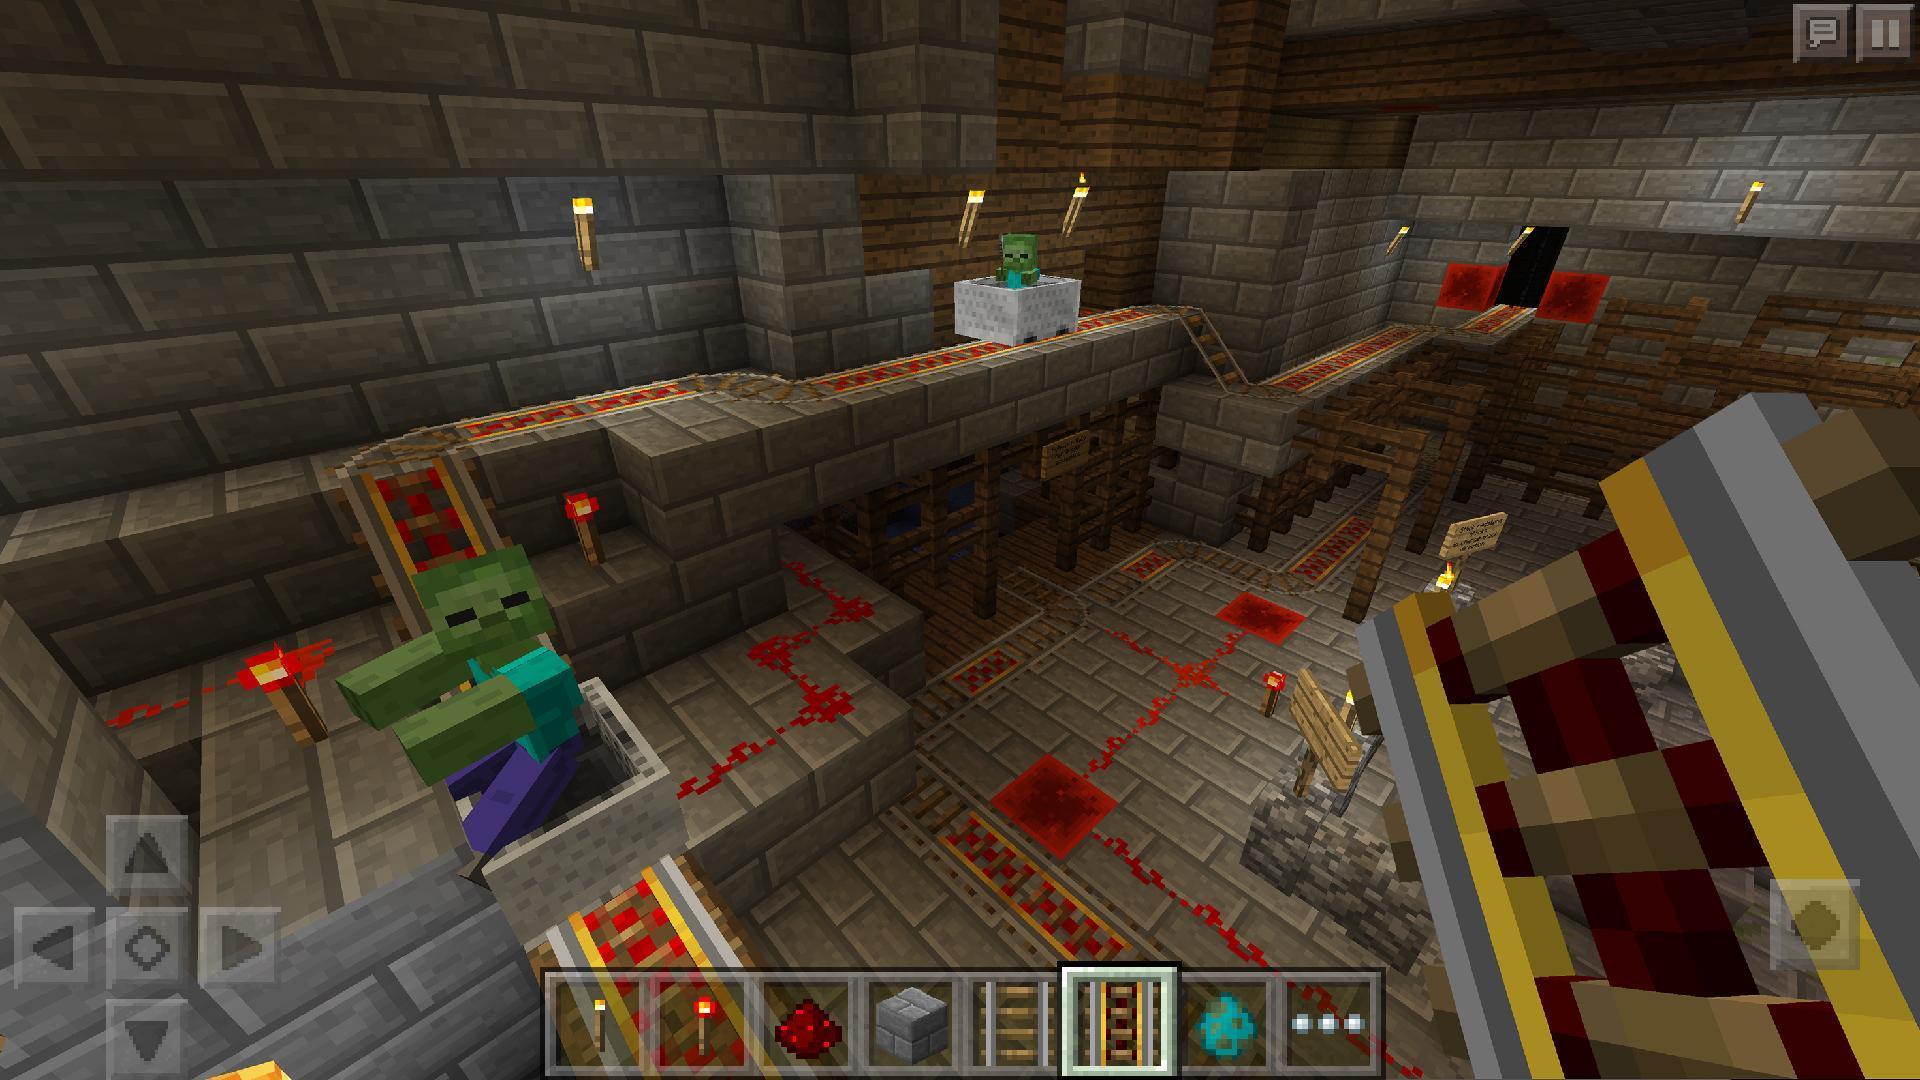 minecraft download free 1.8 mojang